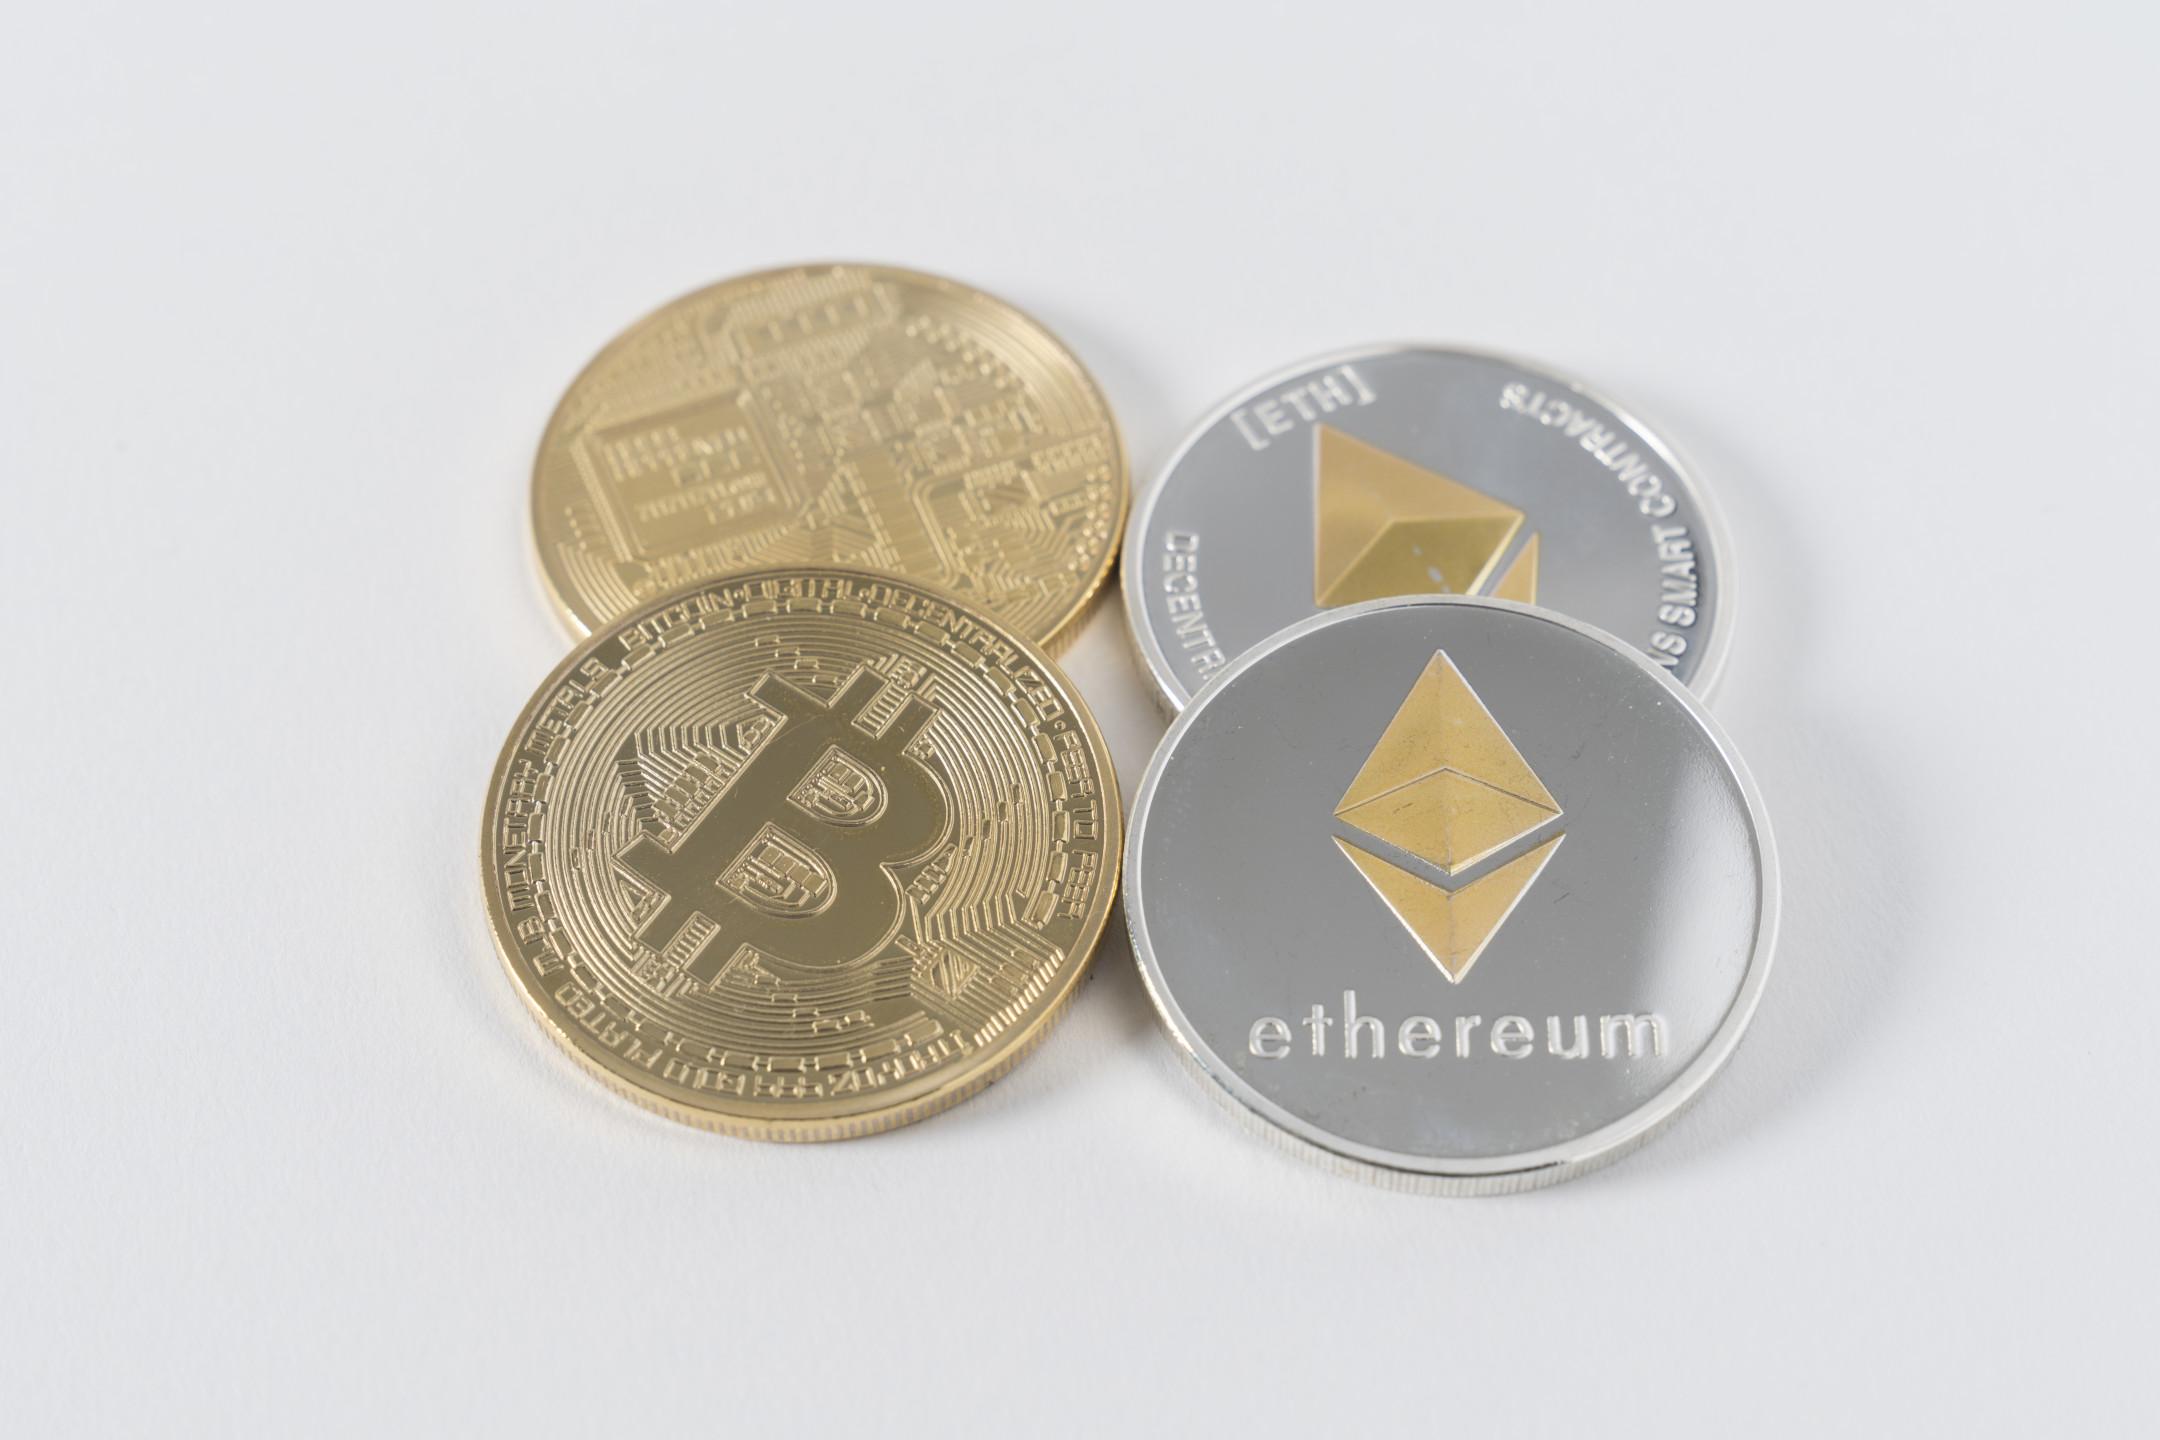 Ethereum price analysis - Will ETHUSD uptrend continue?